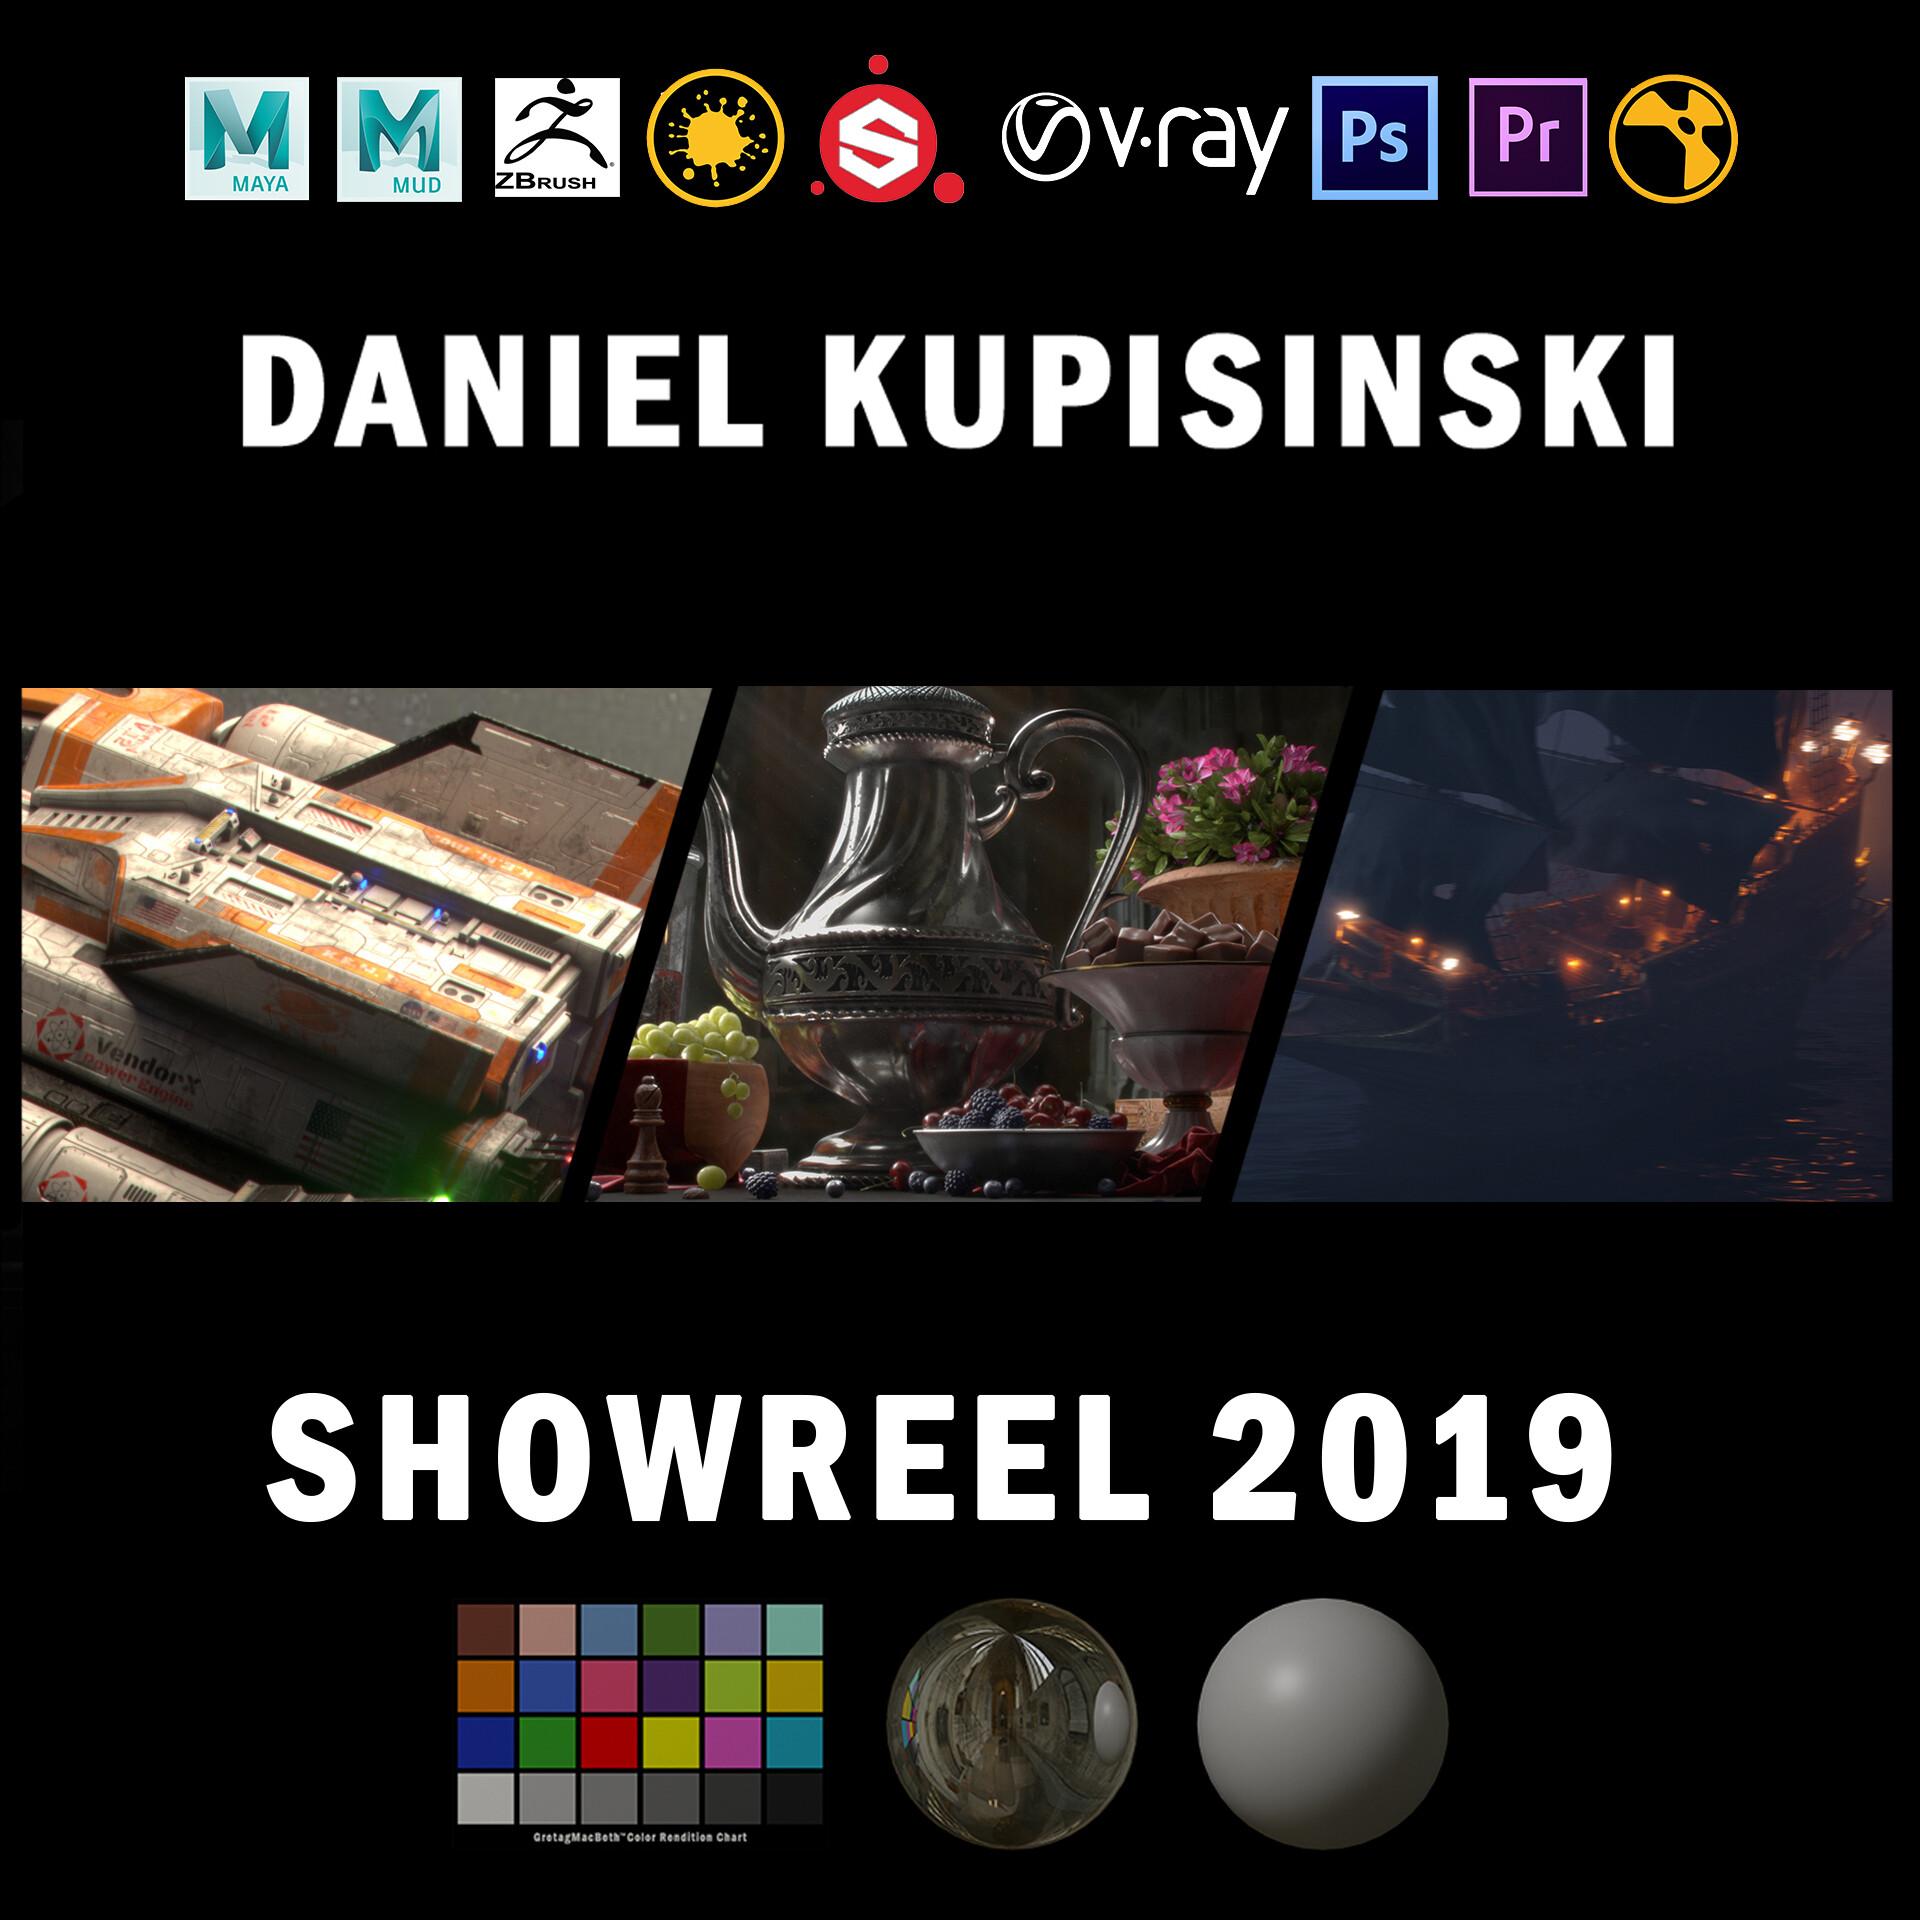 ArtStation - Daniel Kupisinski 2019 Student Showreel - Look